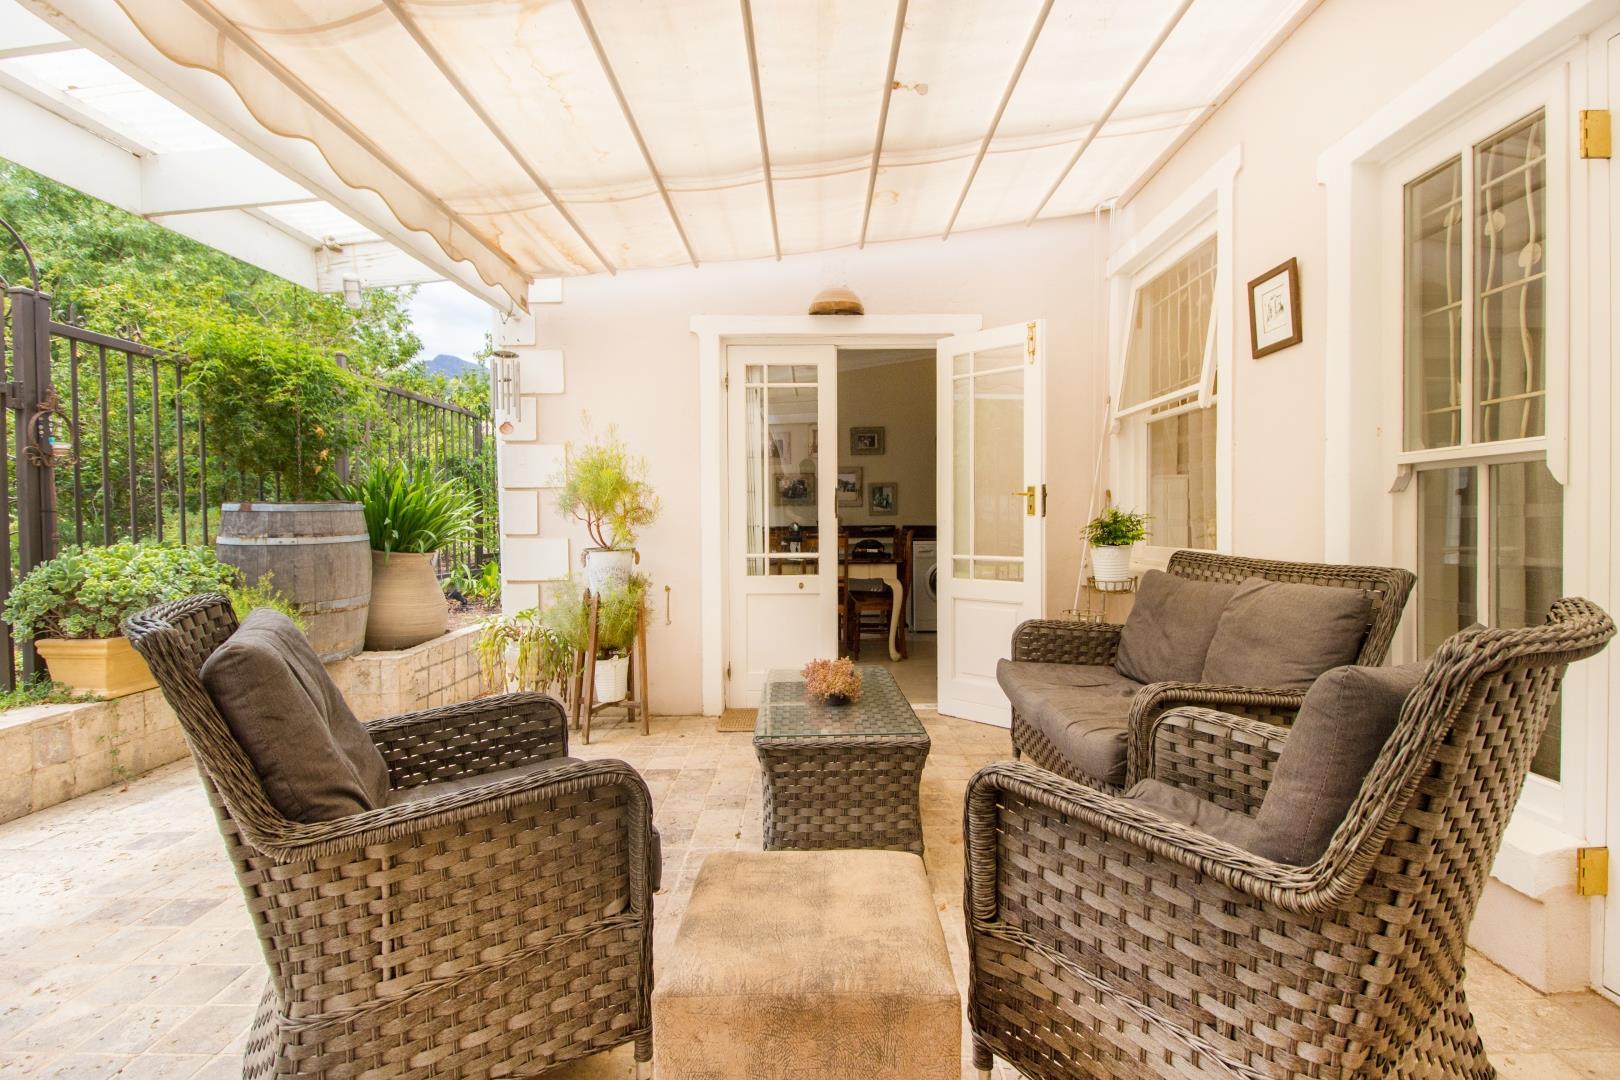 2 Bedroom House For Sale in Franschhoek